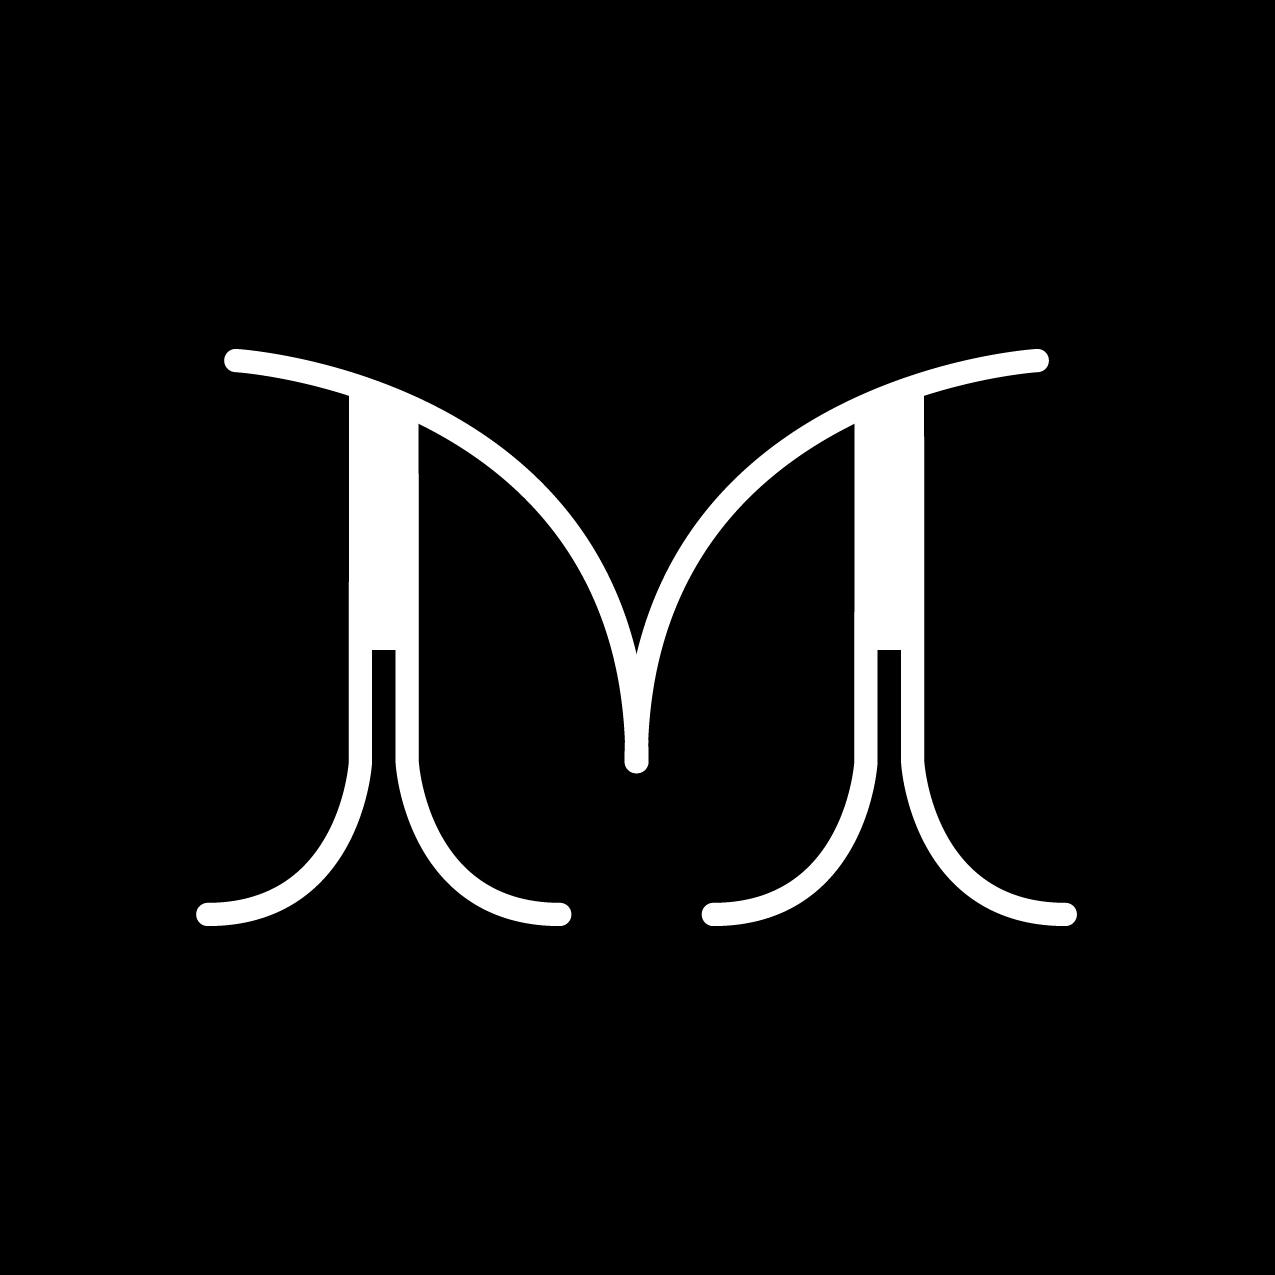 Letter M2 Design by Furia